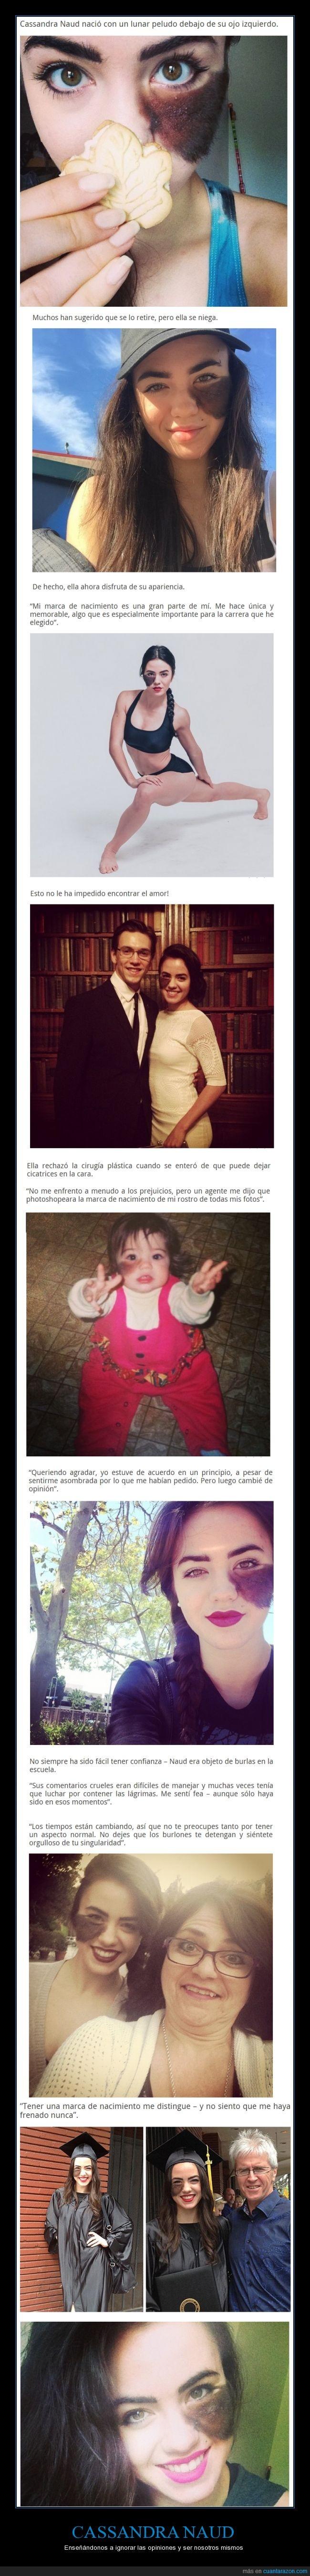 antojo,Cassandra Naud,circo viral,lunar,mancha,marca,nacimiento,peca,pelo,peluda,topo